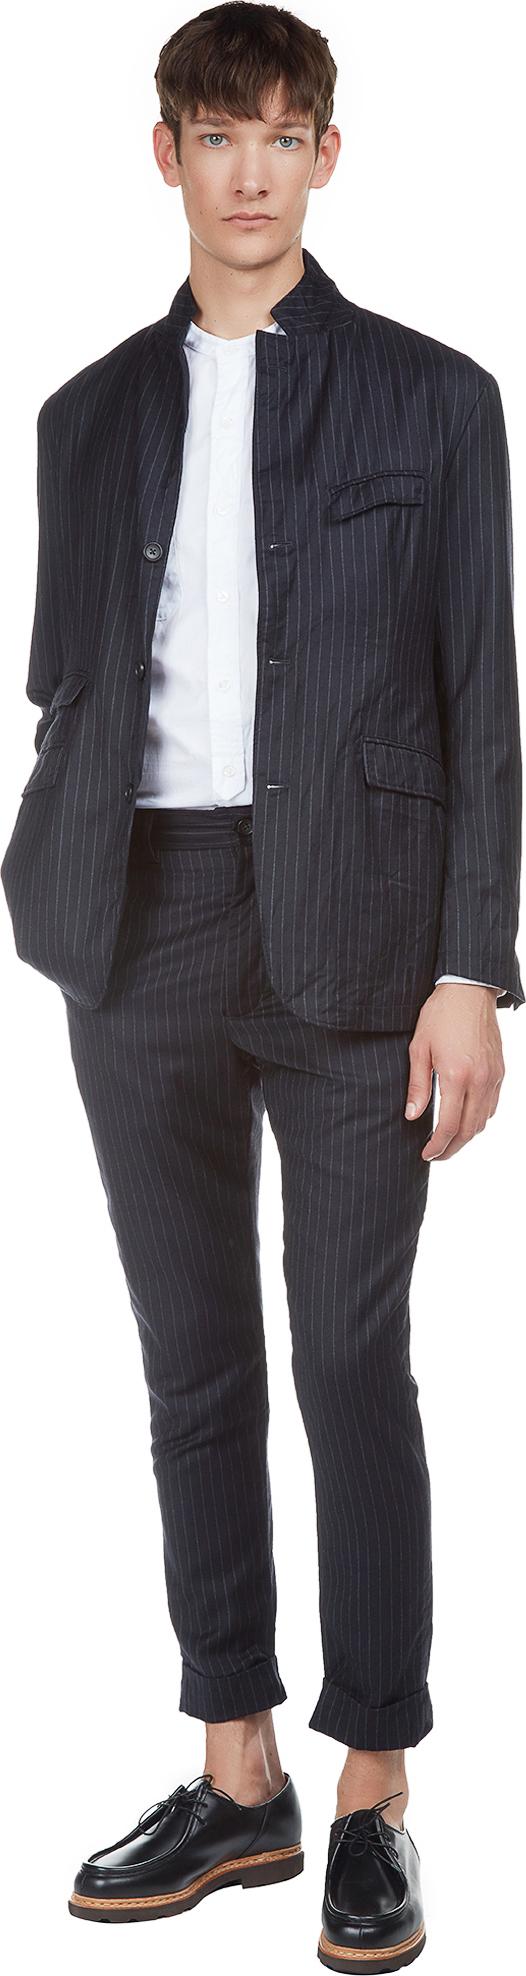 Stripe Andover Jacket   Engineered Garments   LOIT